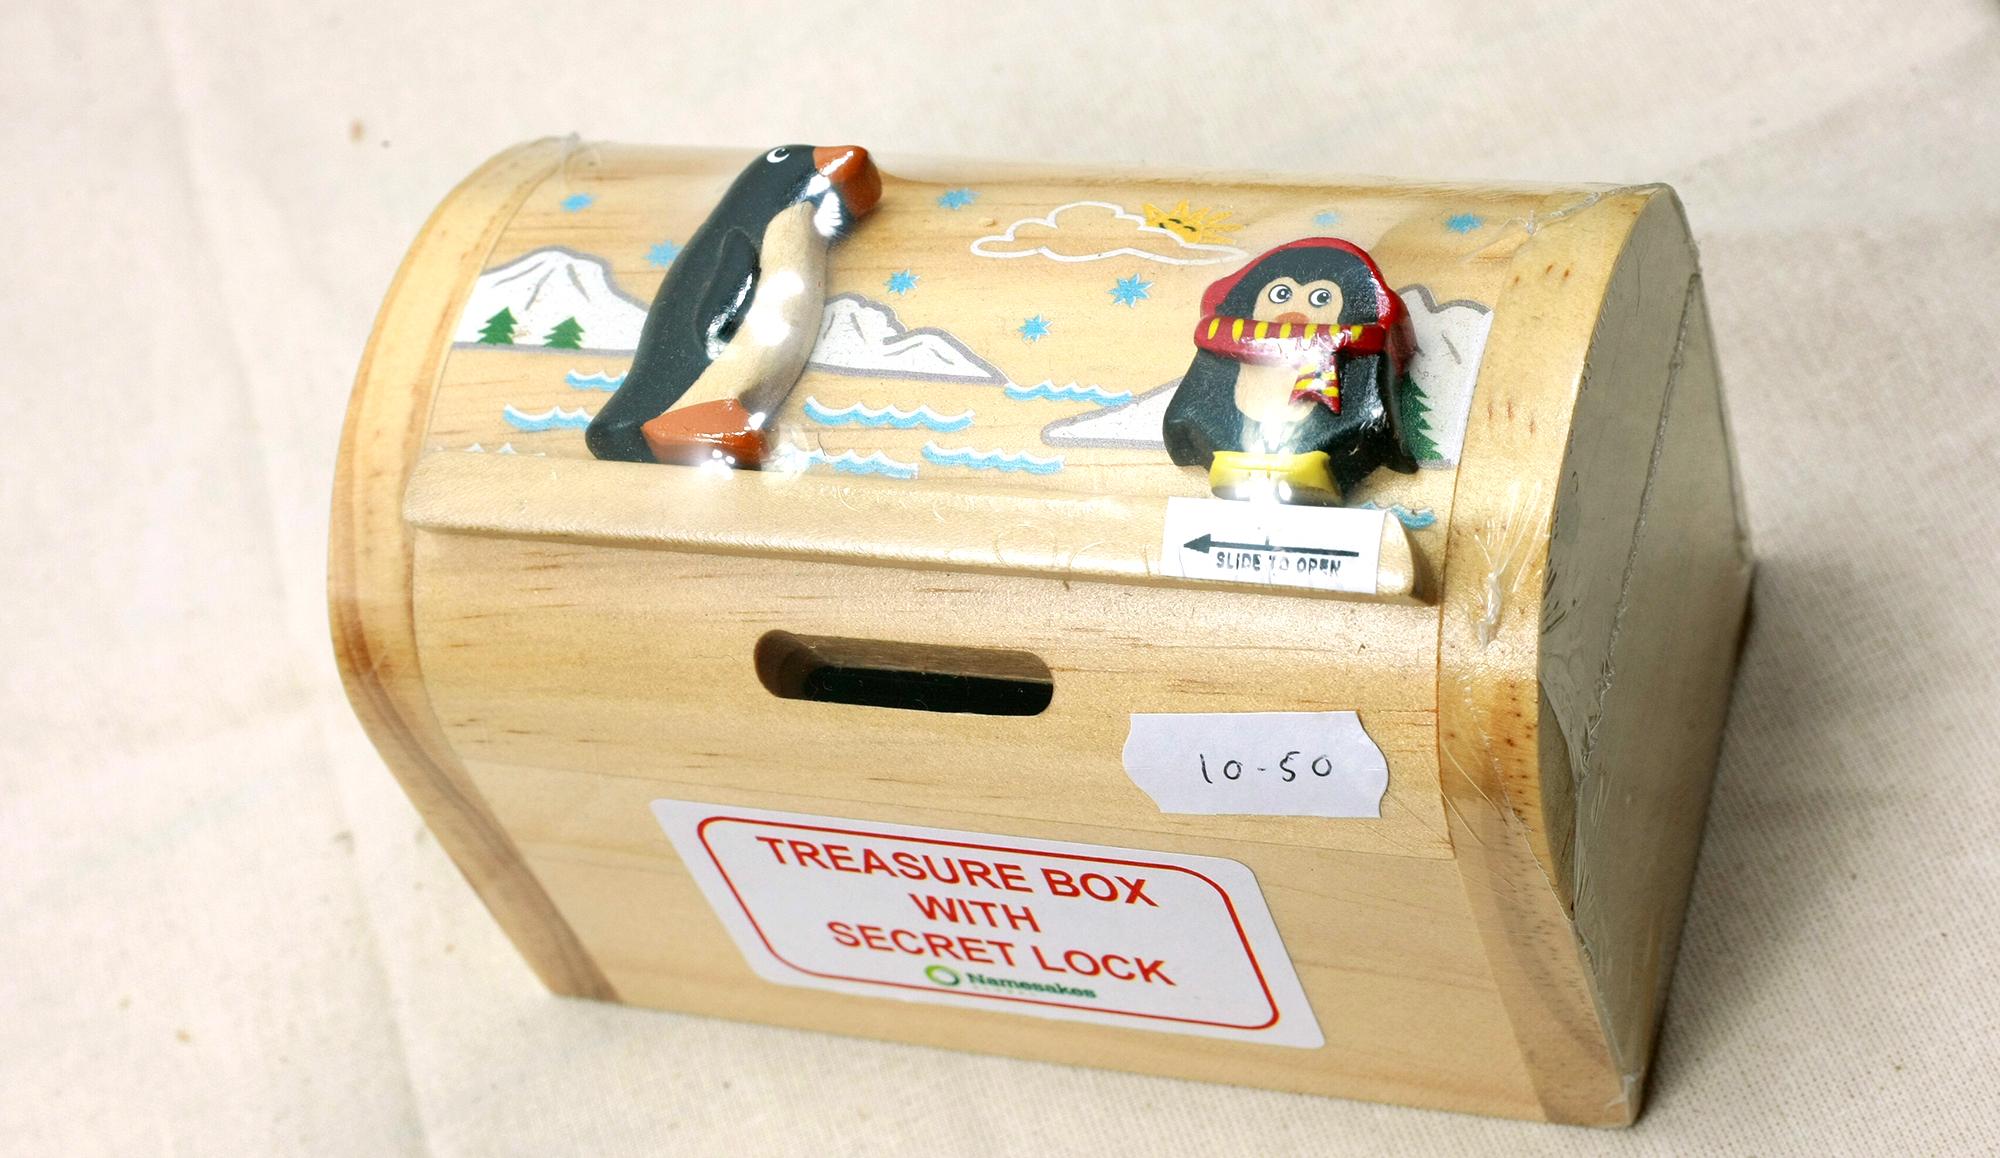 Wooden Penguin Treasure Box With Secret Lock Penguin Corner